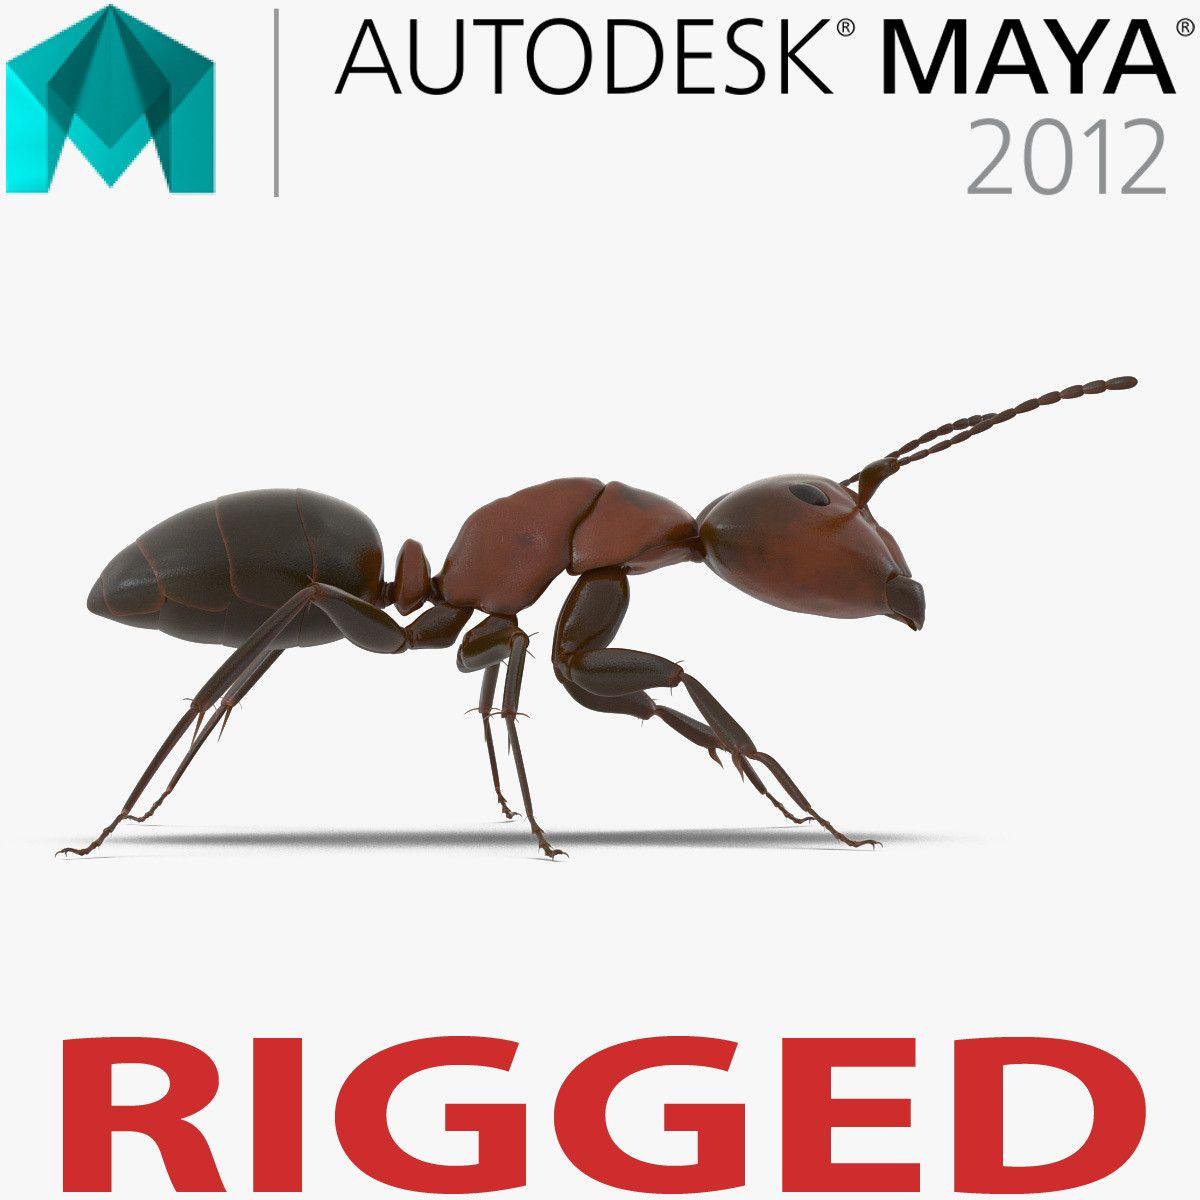 red ant 3d model rigged for maya animal 3d models pinterest